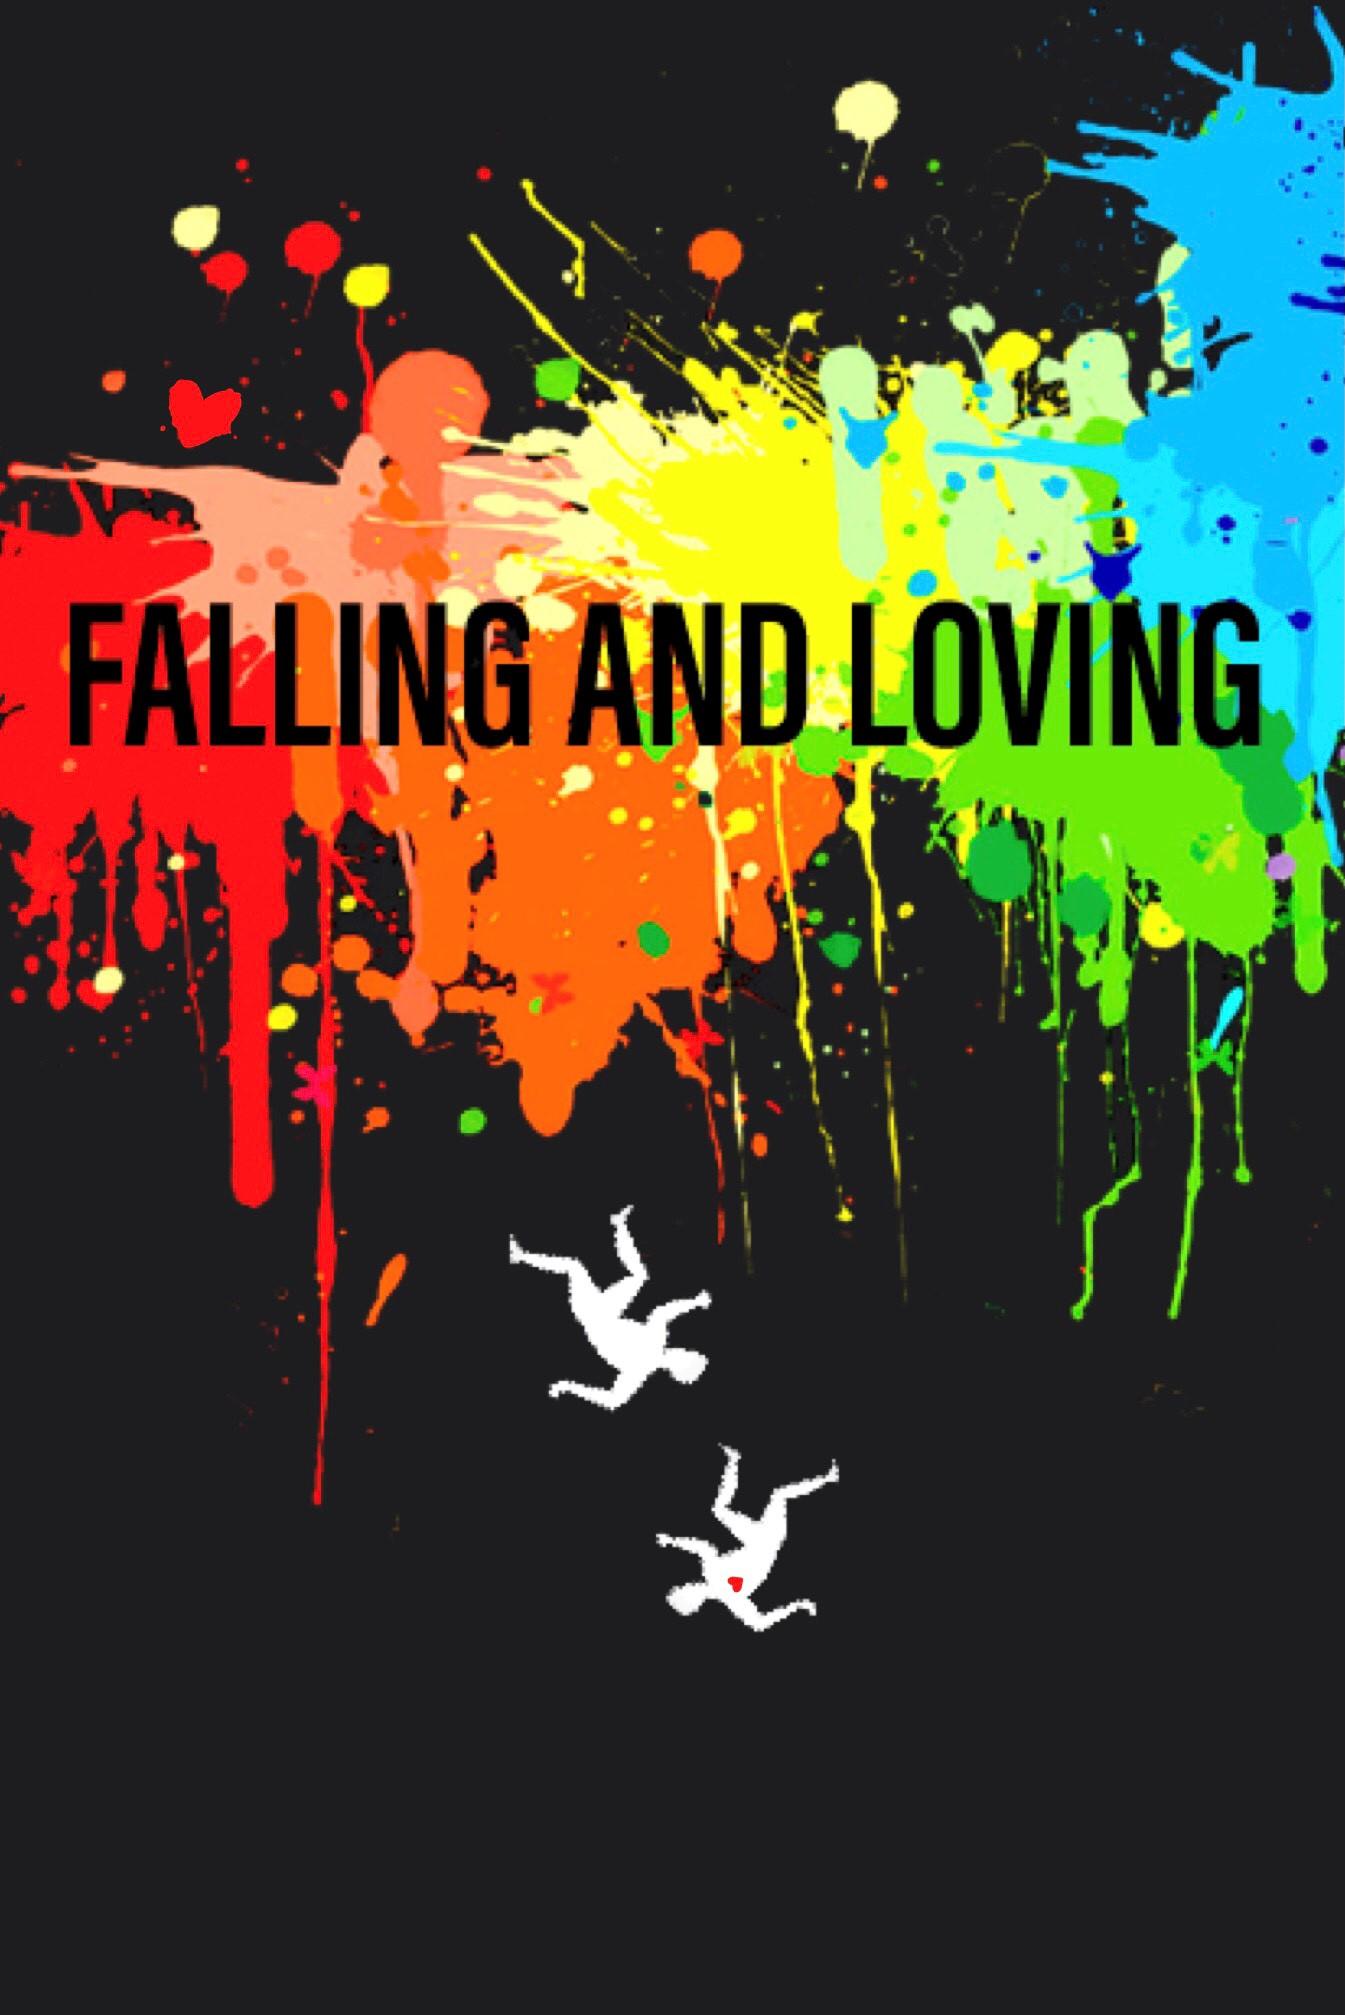 NKU_Falling and Loving logo